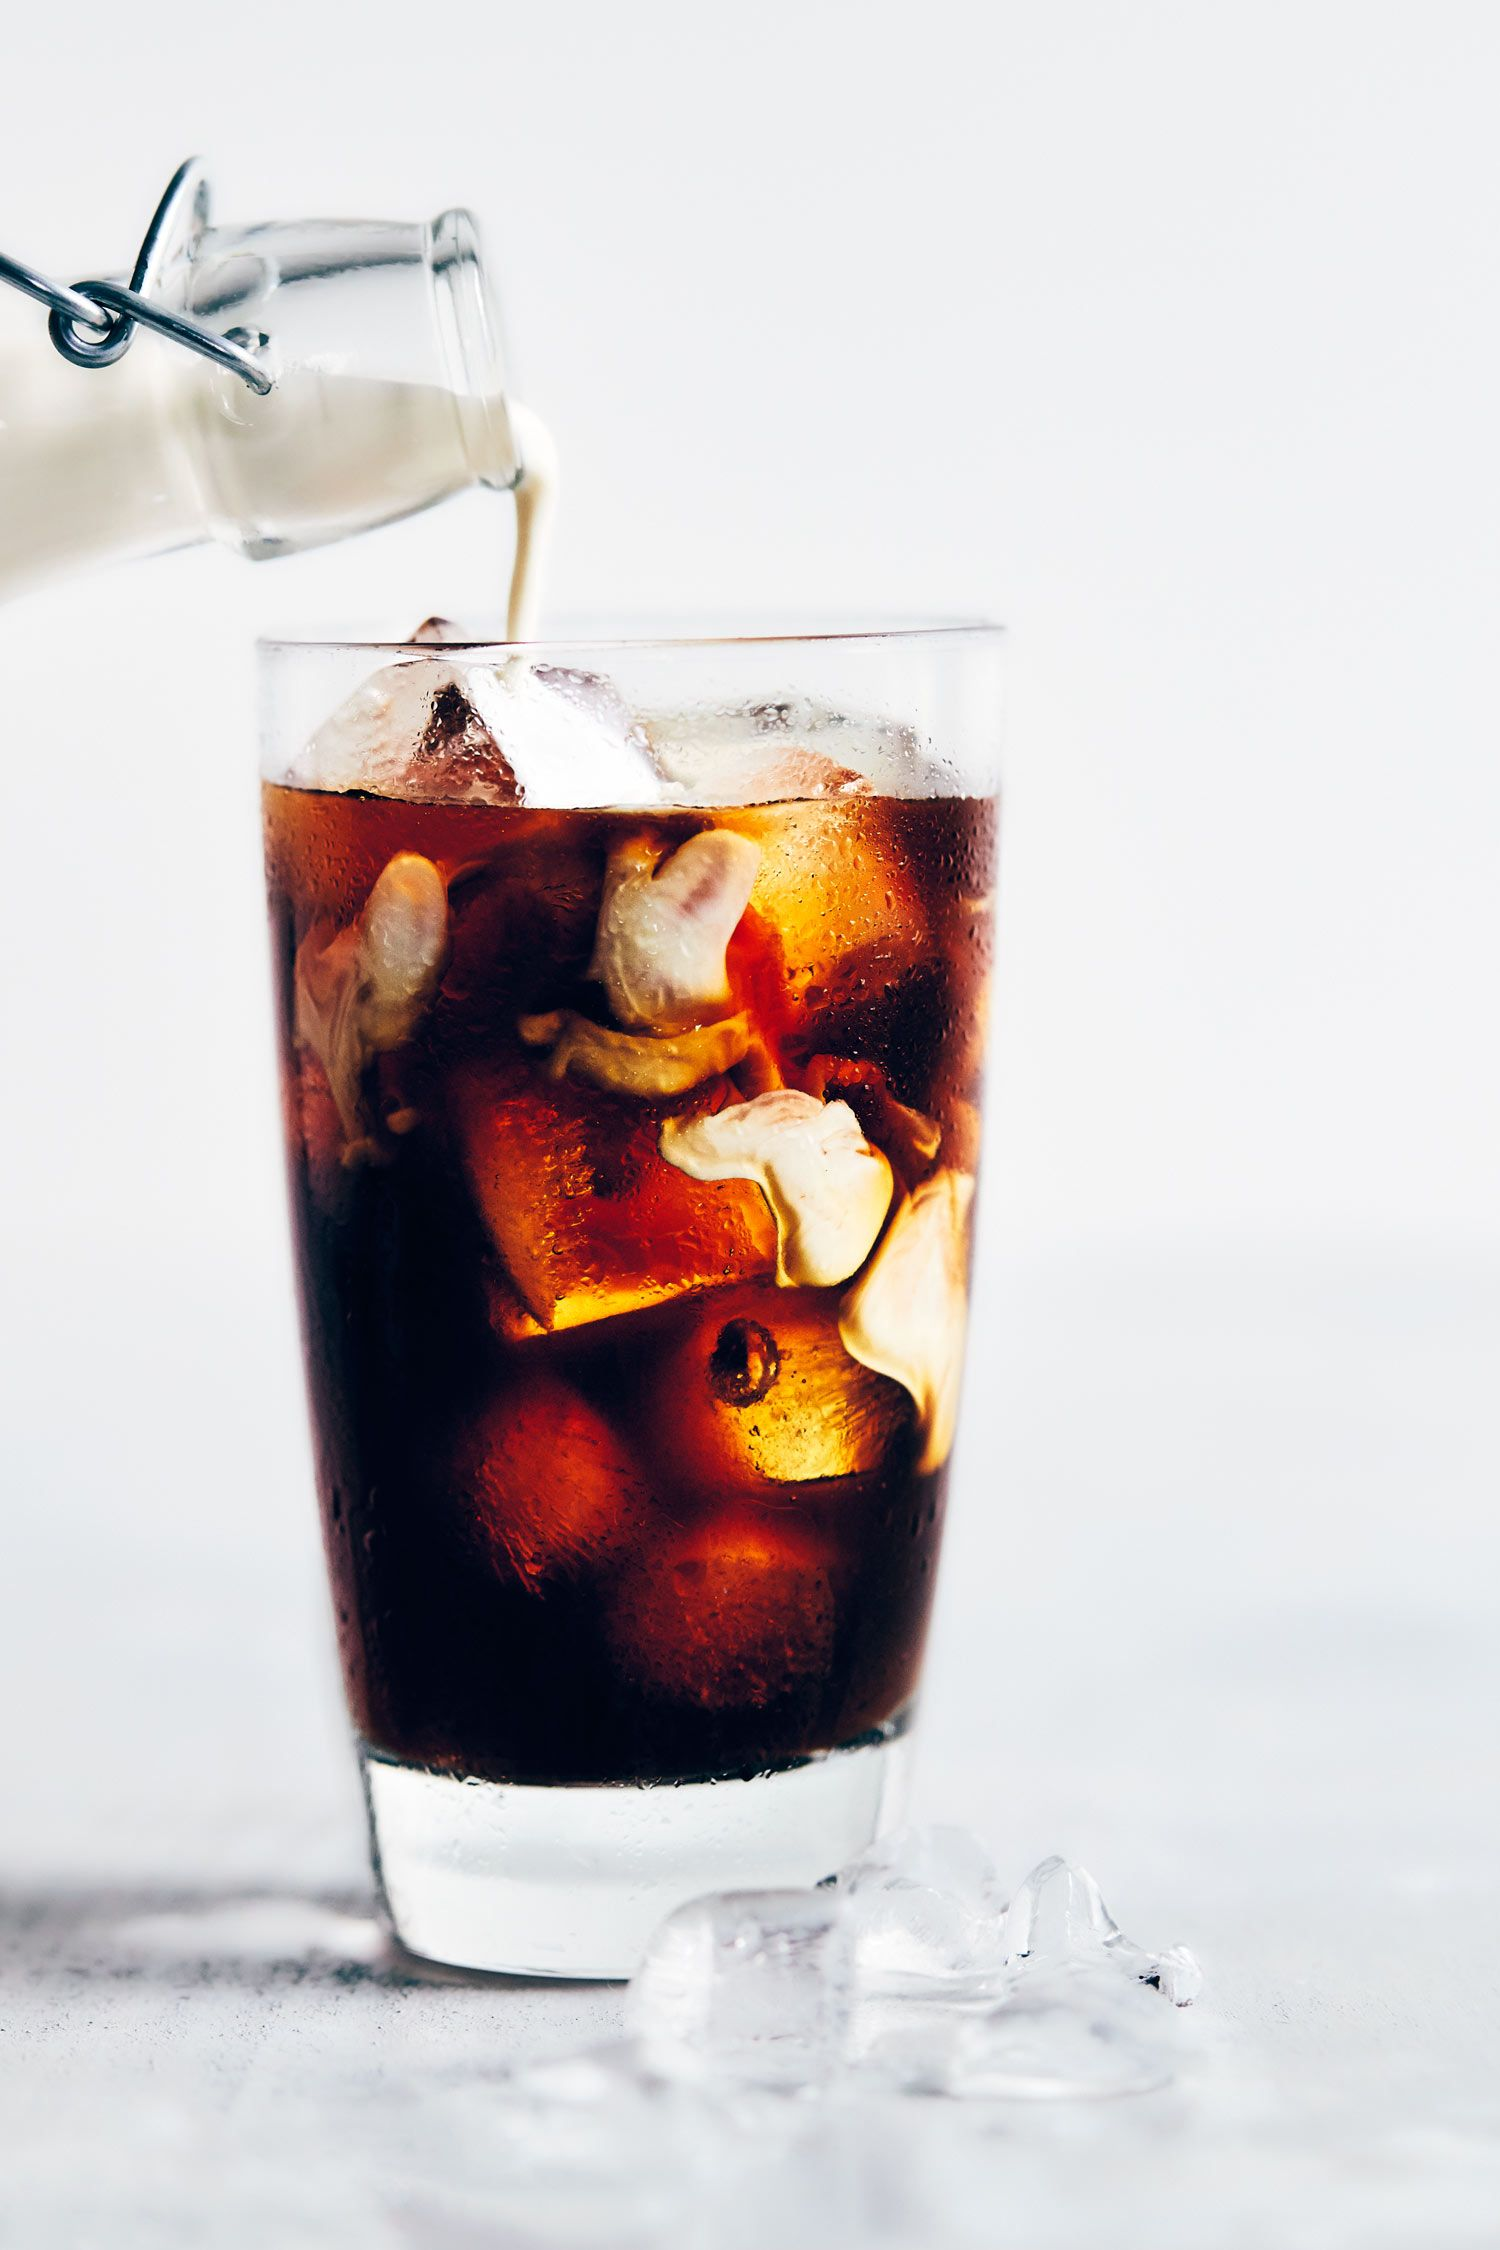 Mason Jar Cold Brew Coffee Coffee brewing, Coffee drinks